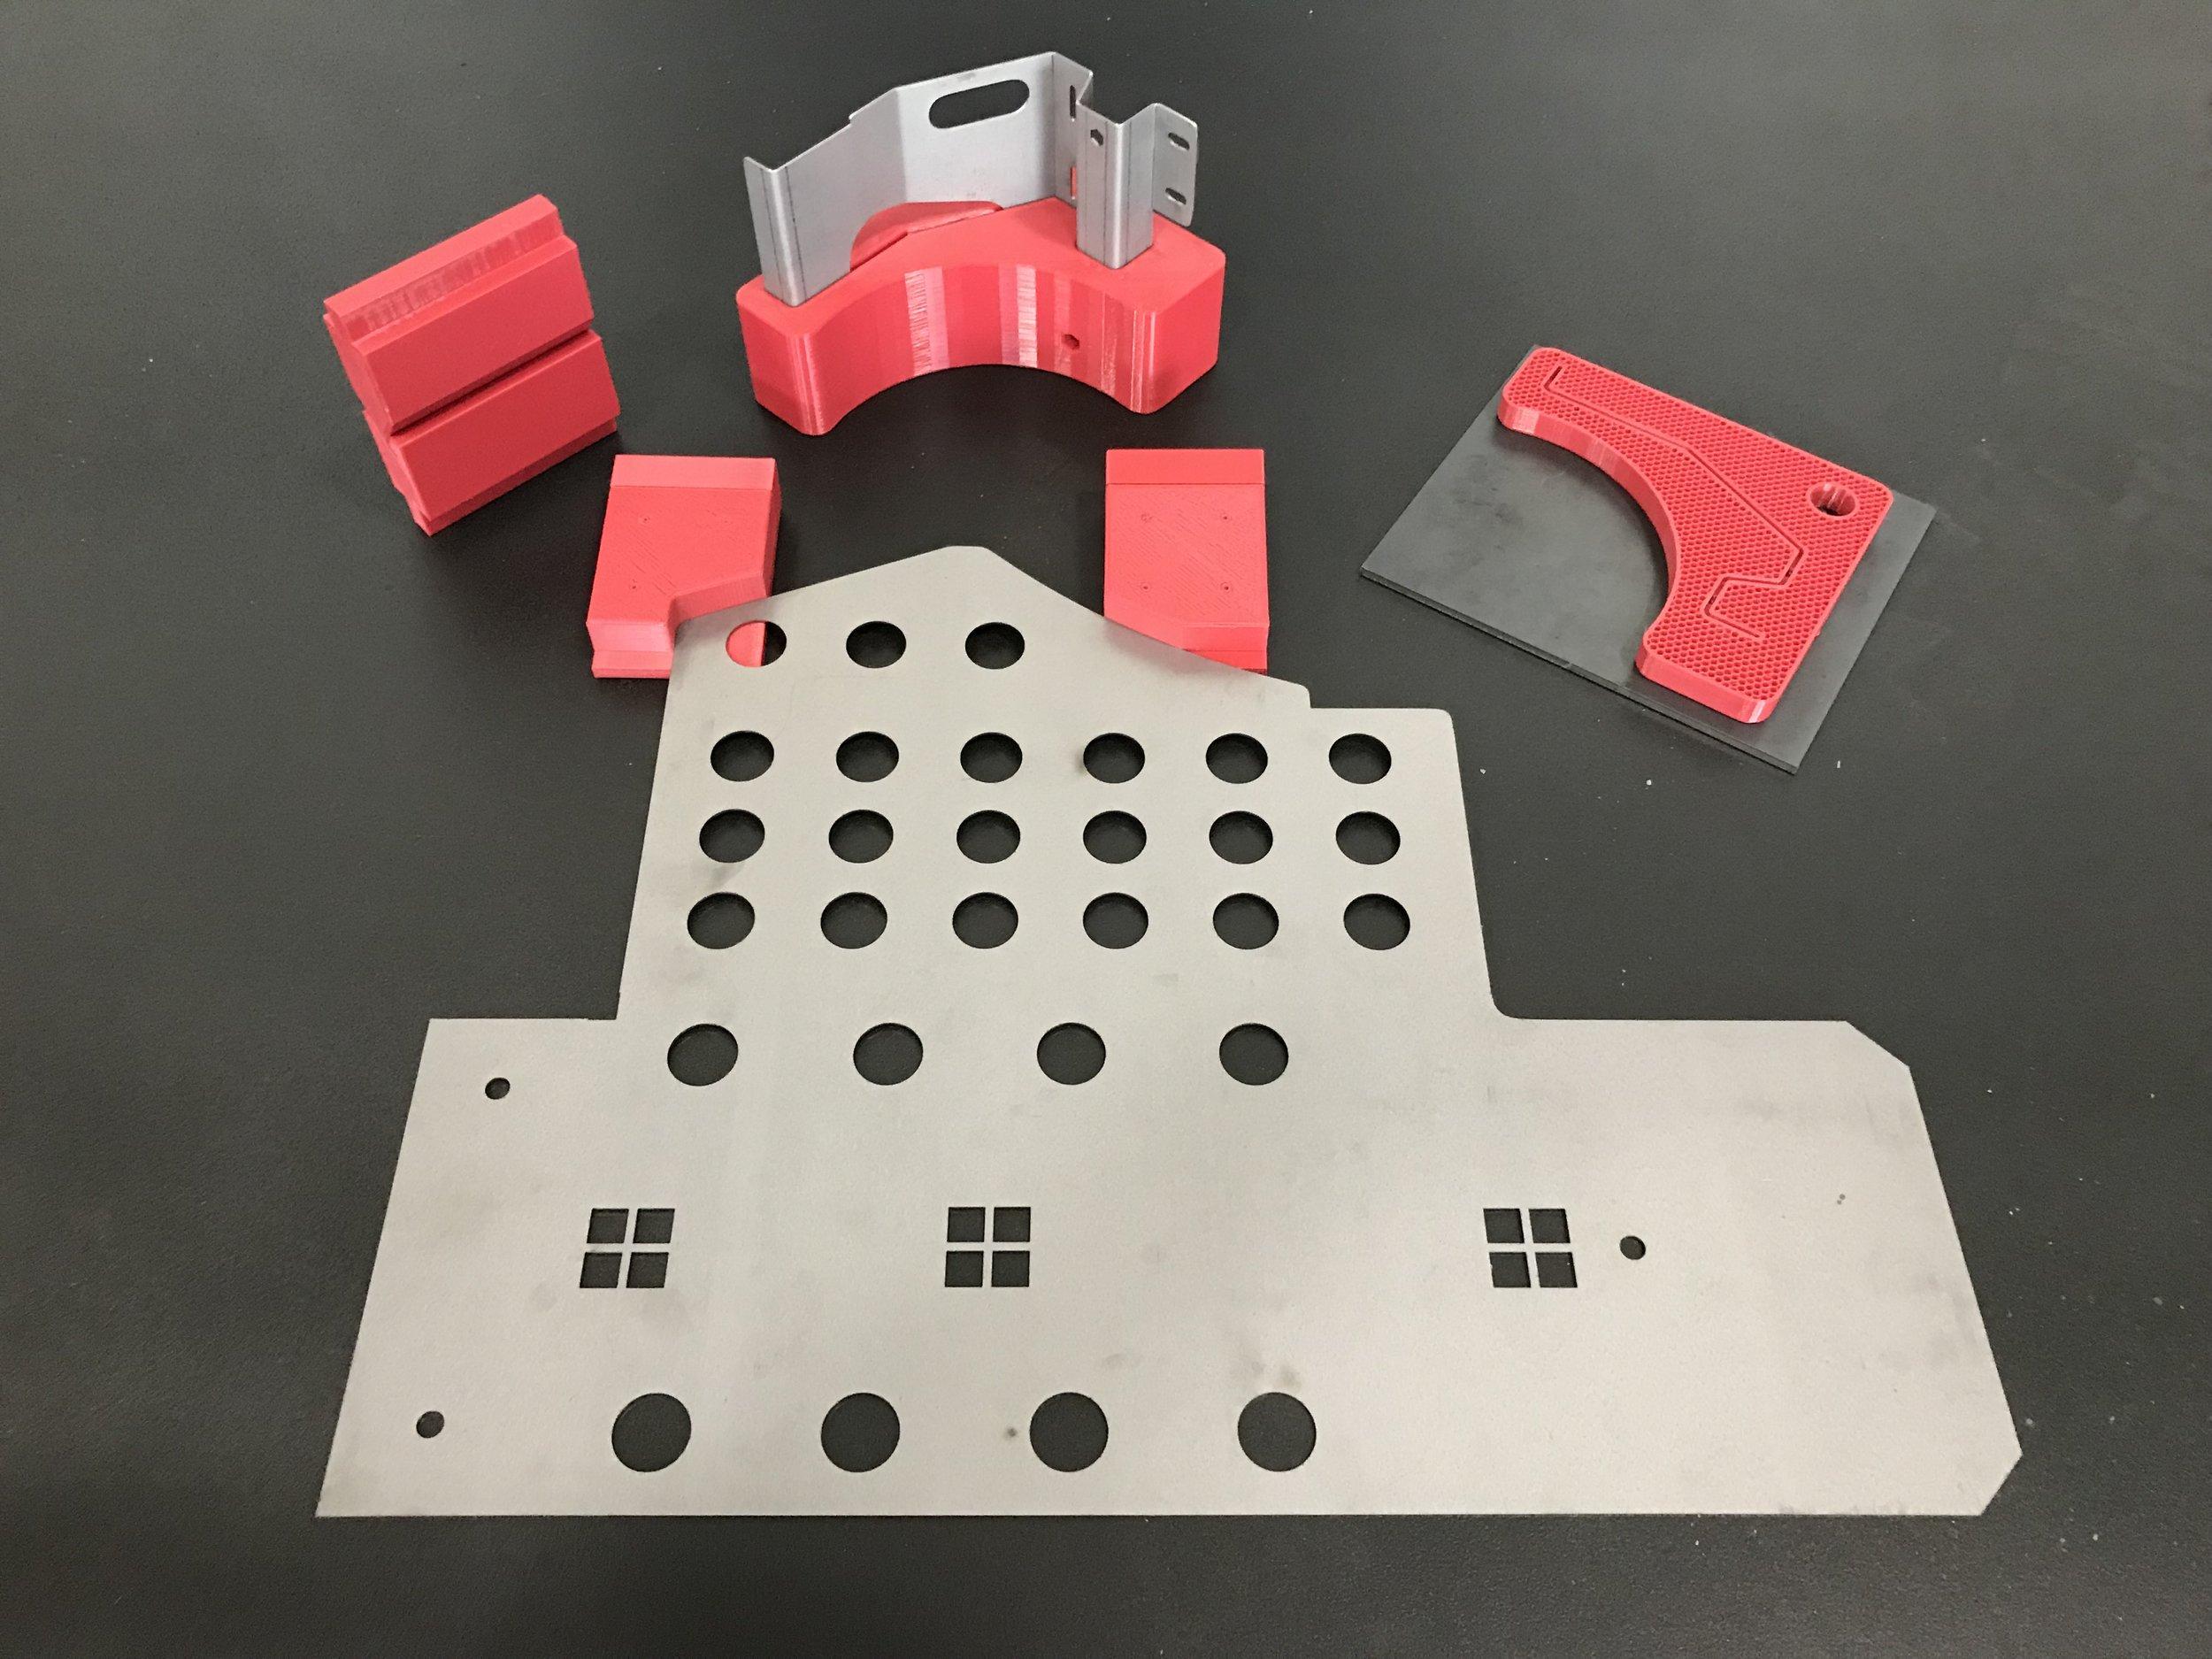 3d-press-brake-tooling.jpg